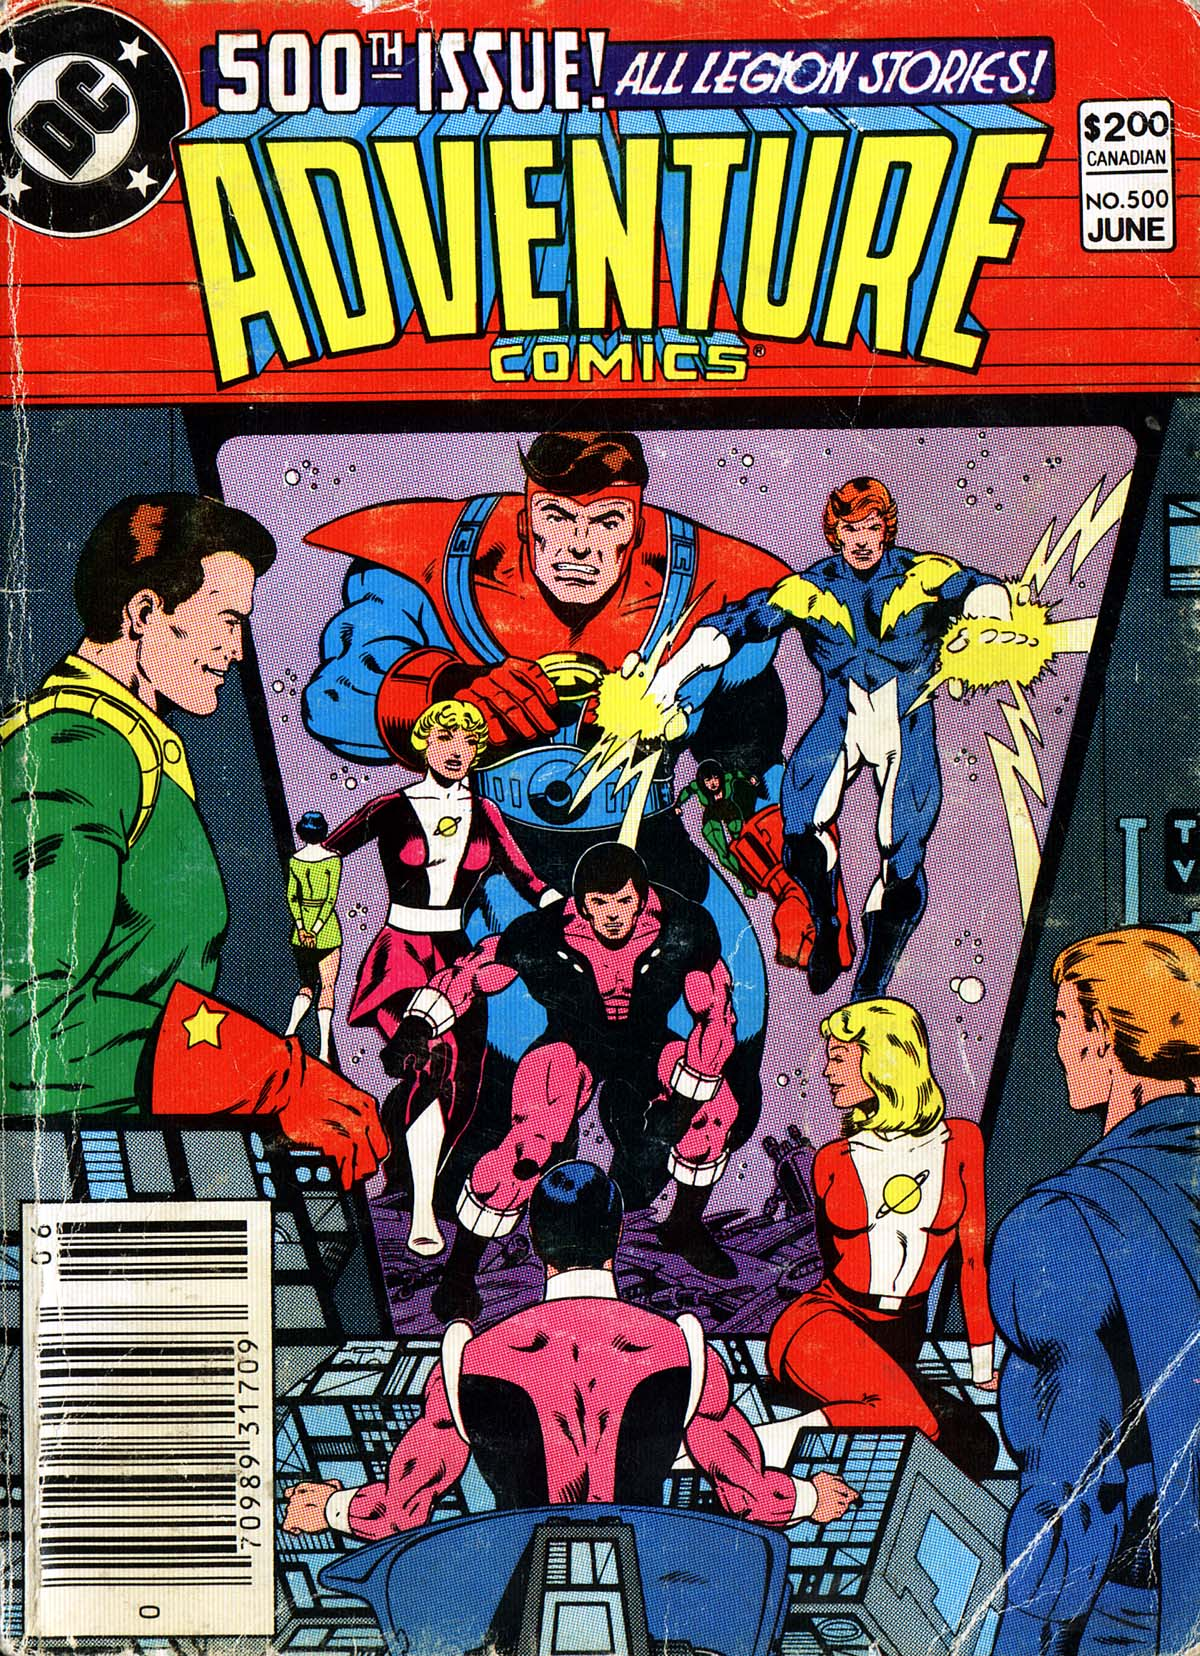 Read online Adventure Comics (1938) comic -  Issue #500 - 1